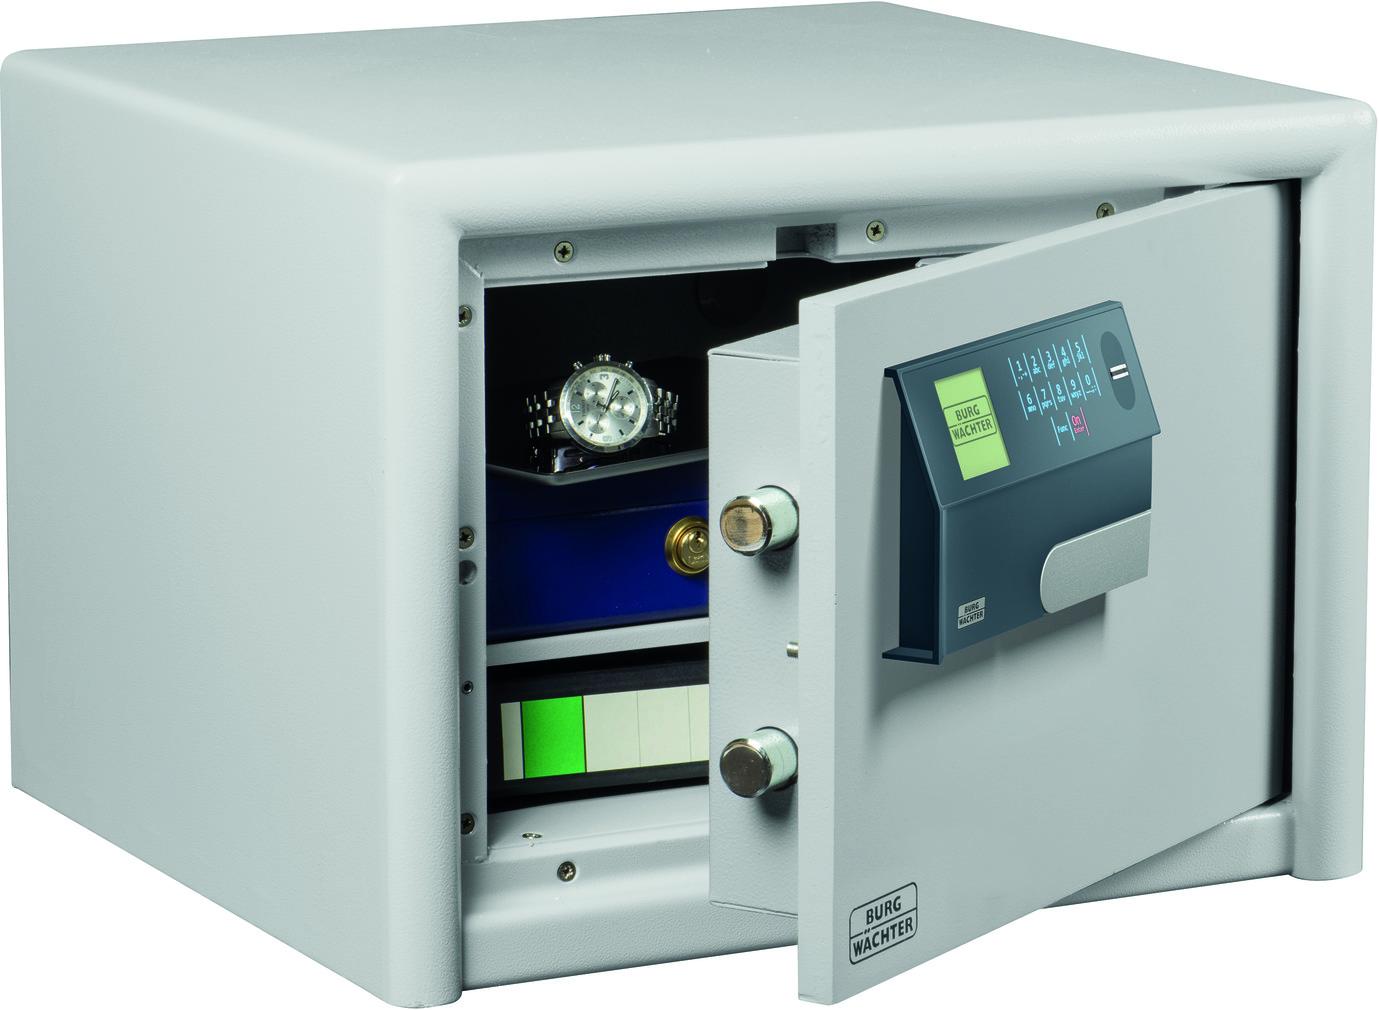 Feuerschutztresor mit Fingerscan Dual-Safe BURG-WÄCHTER